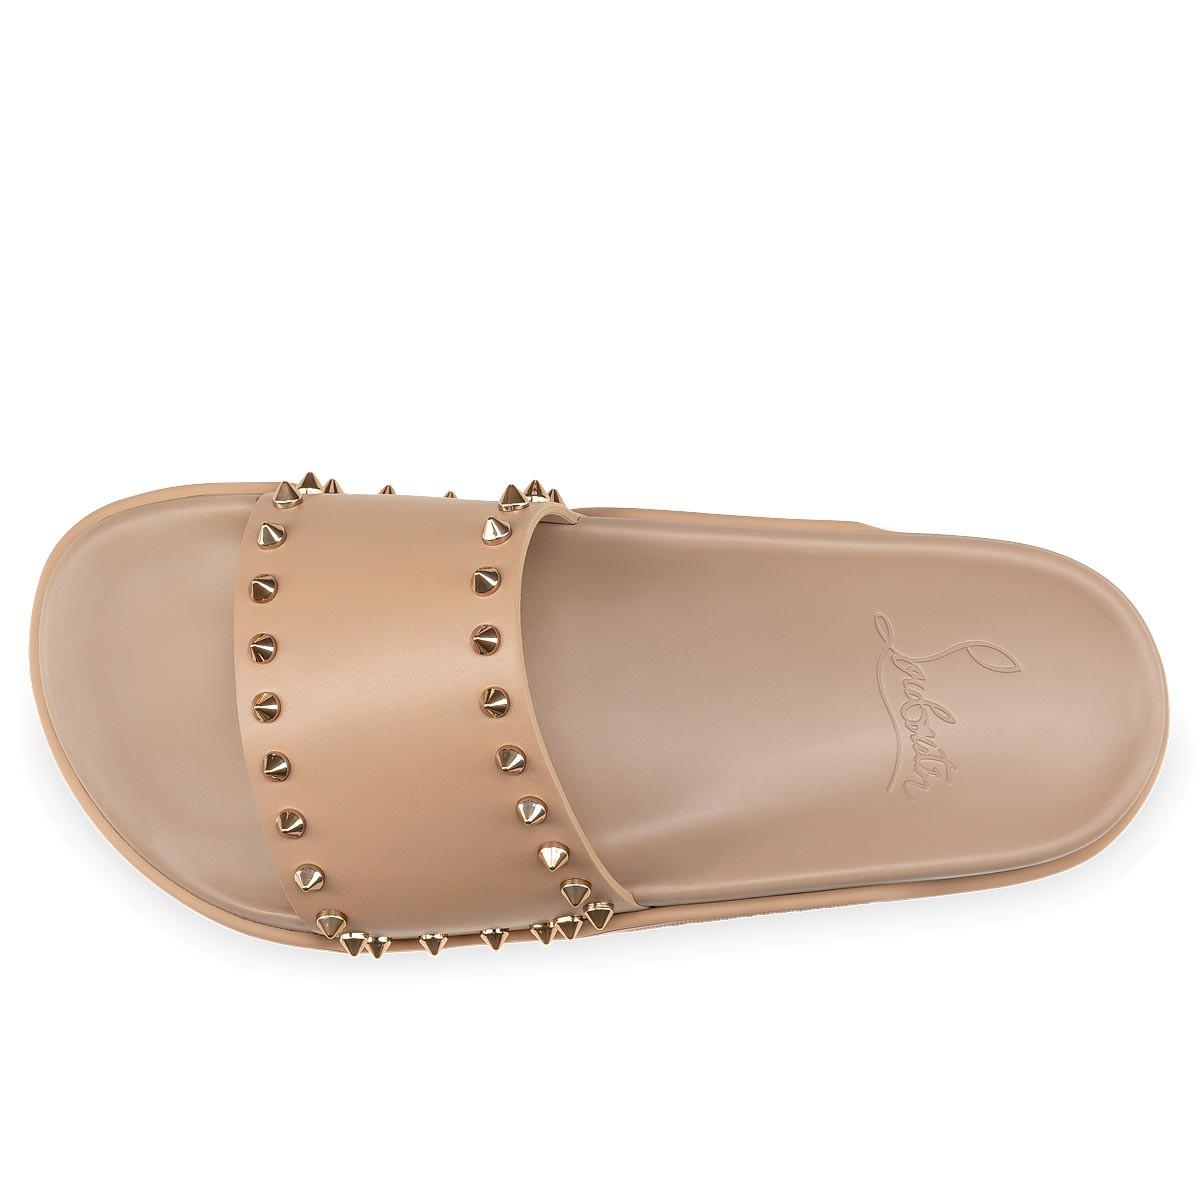 Shoes - Pool Stud Donna Flat - Christian Louboutin